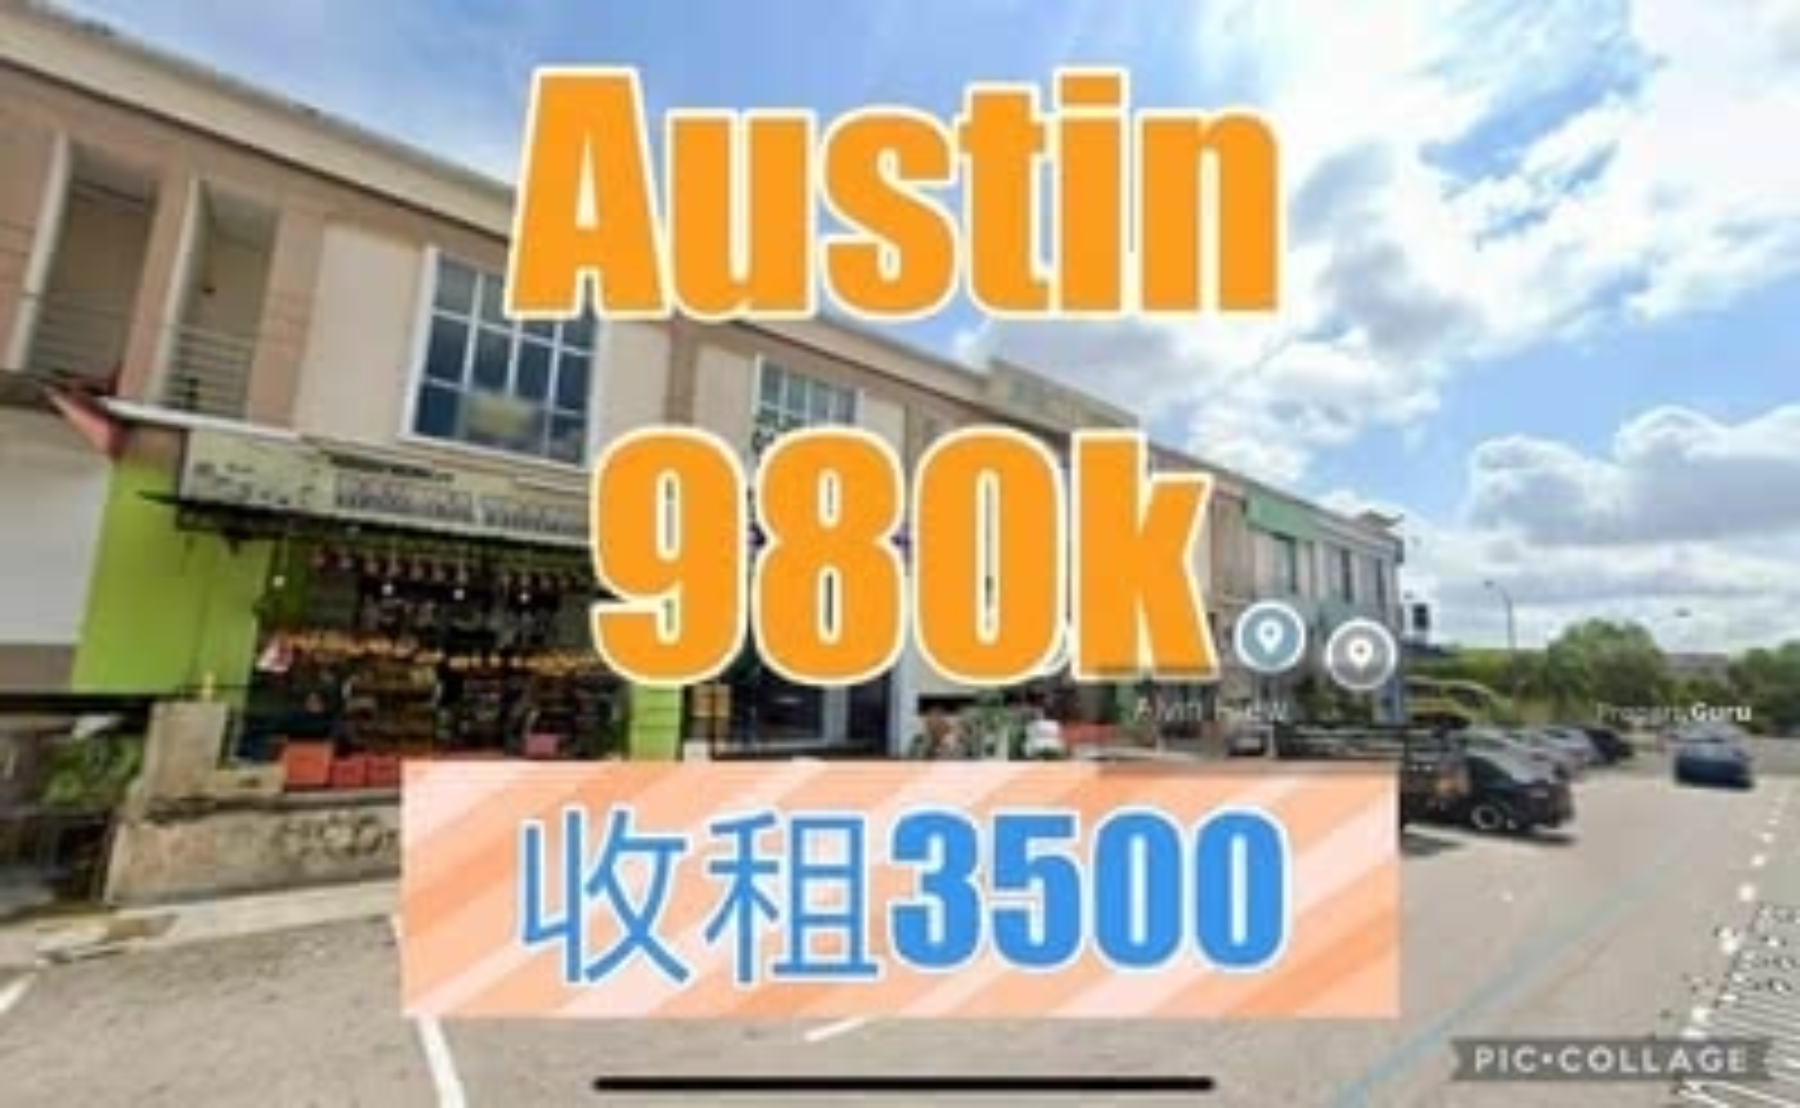 For Sale - Austin / Shoplot